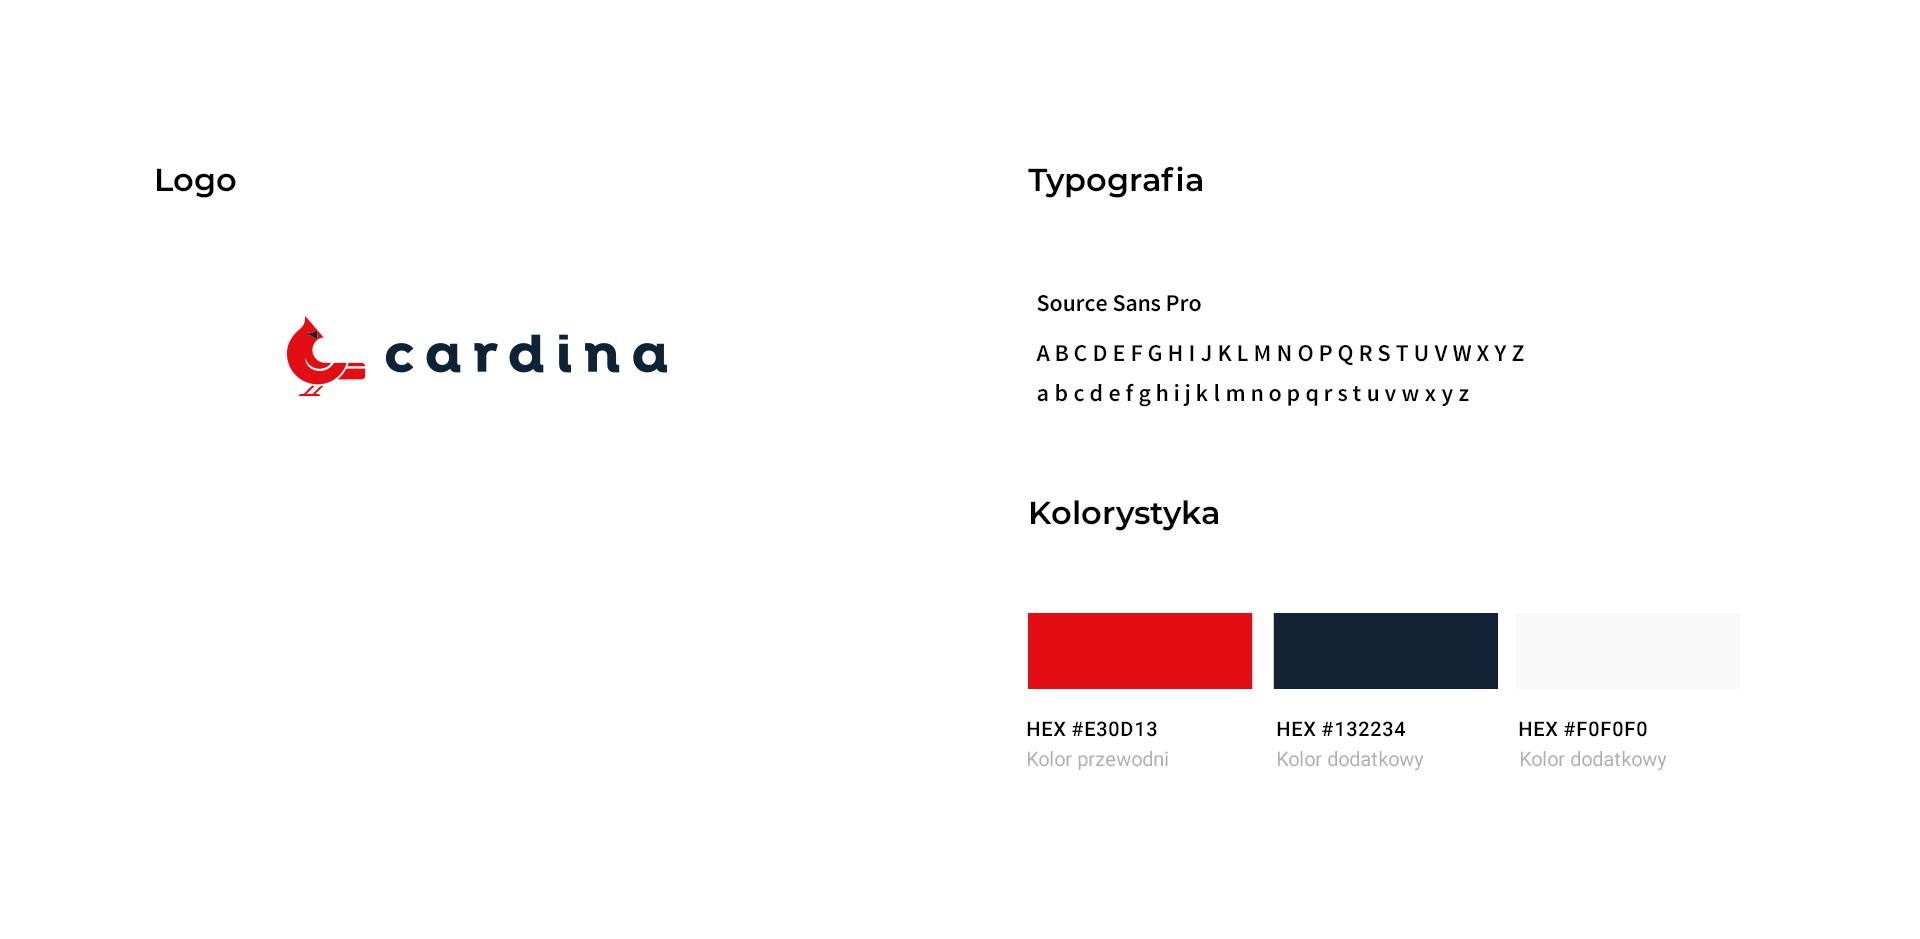 cardina_logo_typografia_kolorystyka